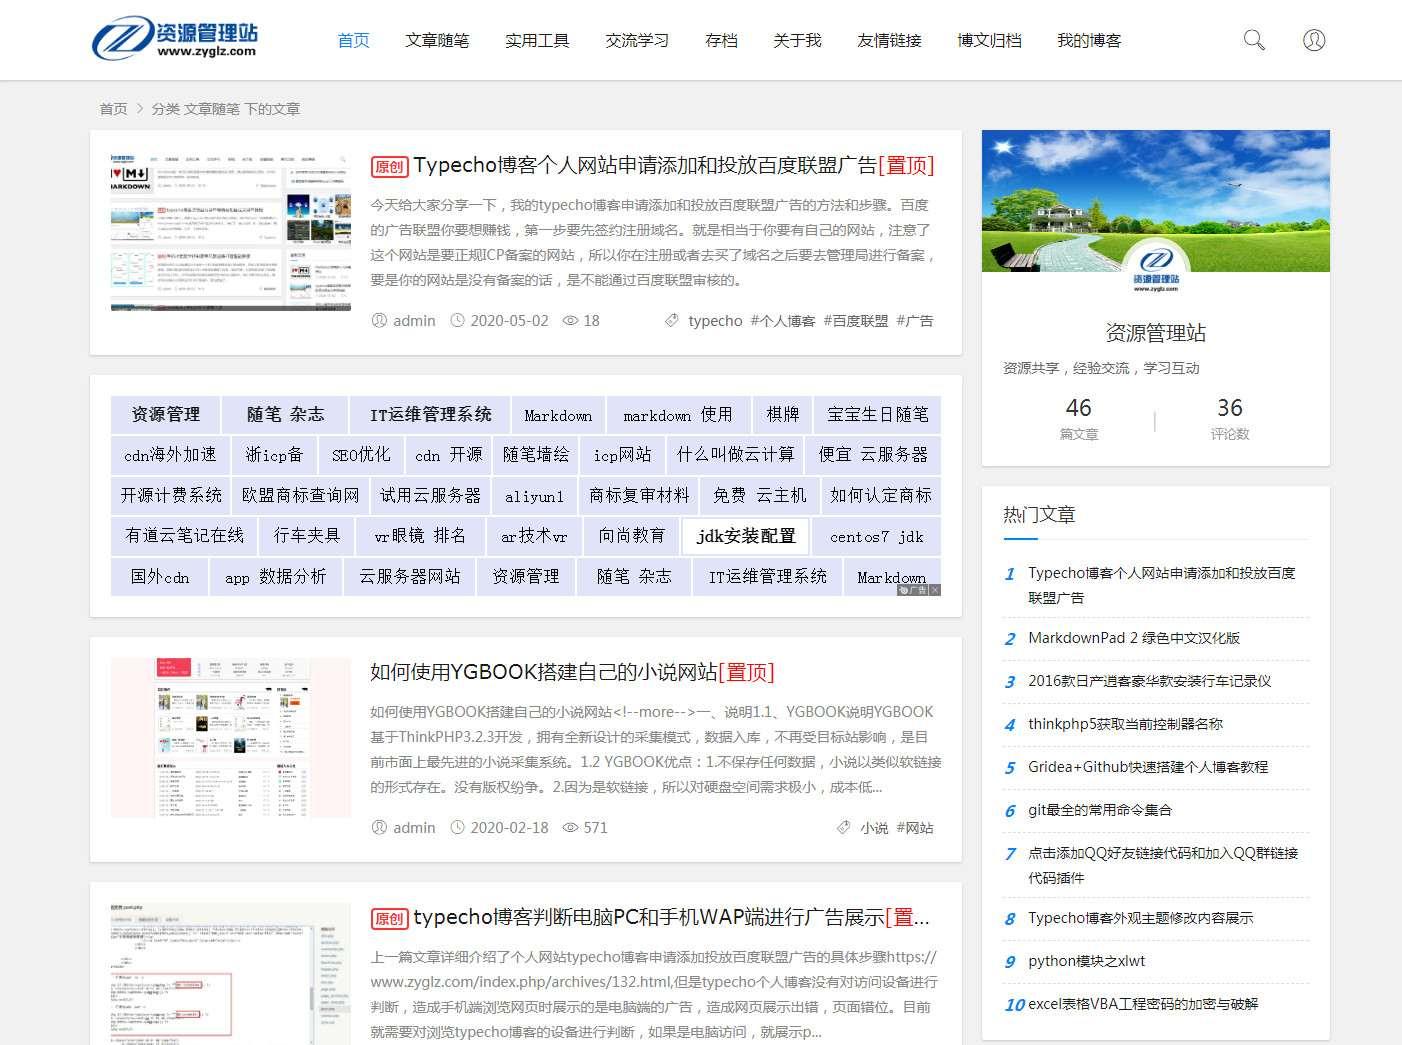 Typecho博客判断在第几篇文章后添加广告